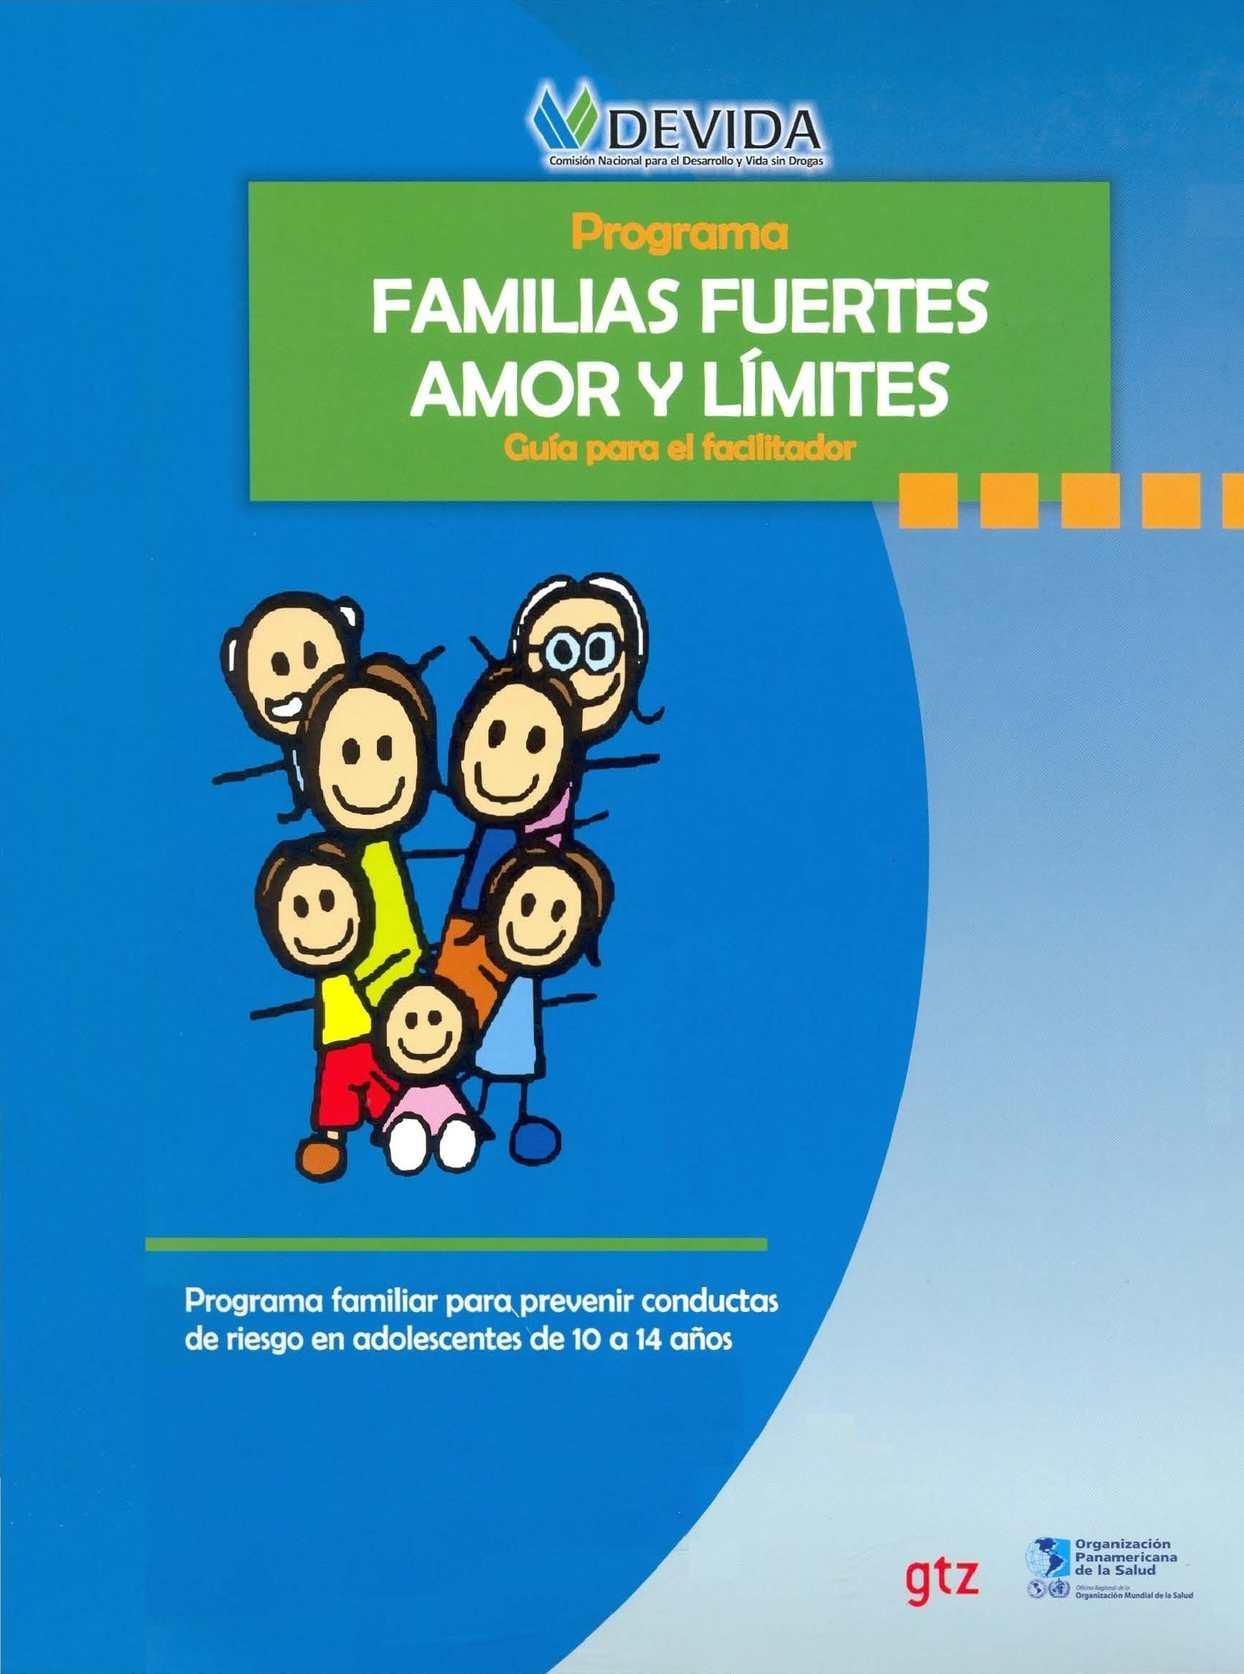 Familias fuertes ppt to pdf